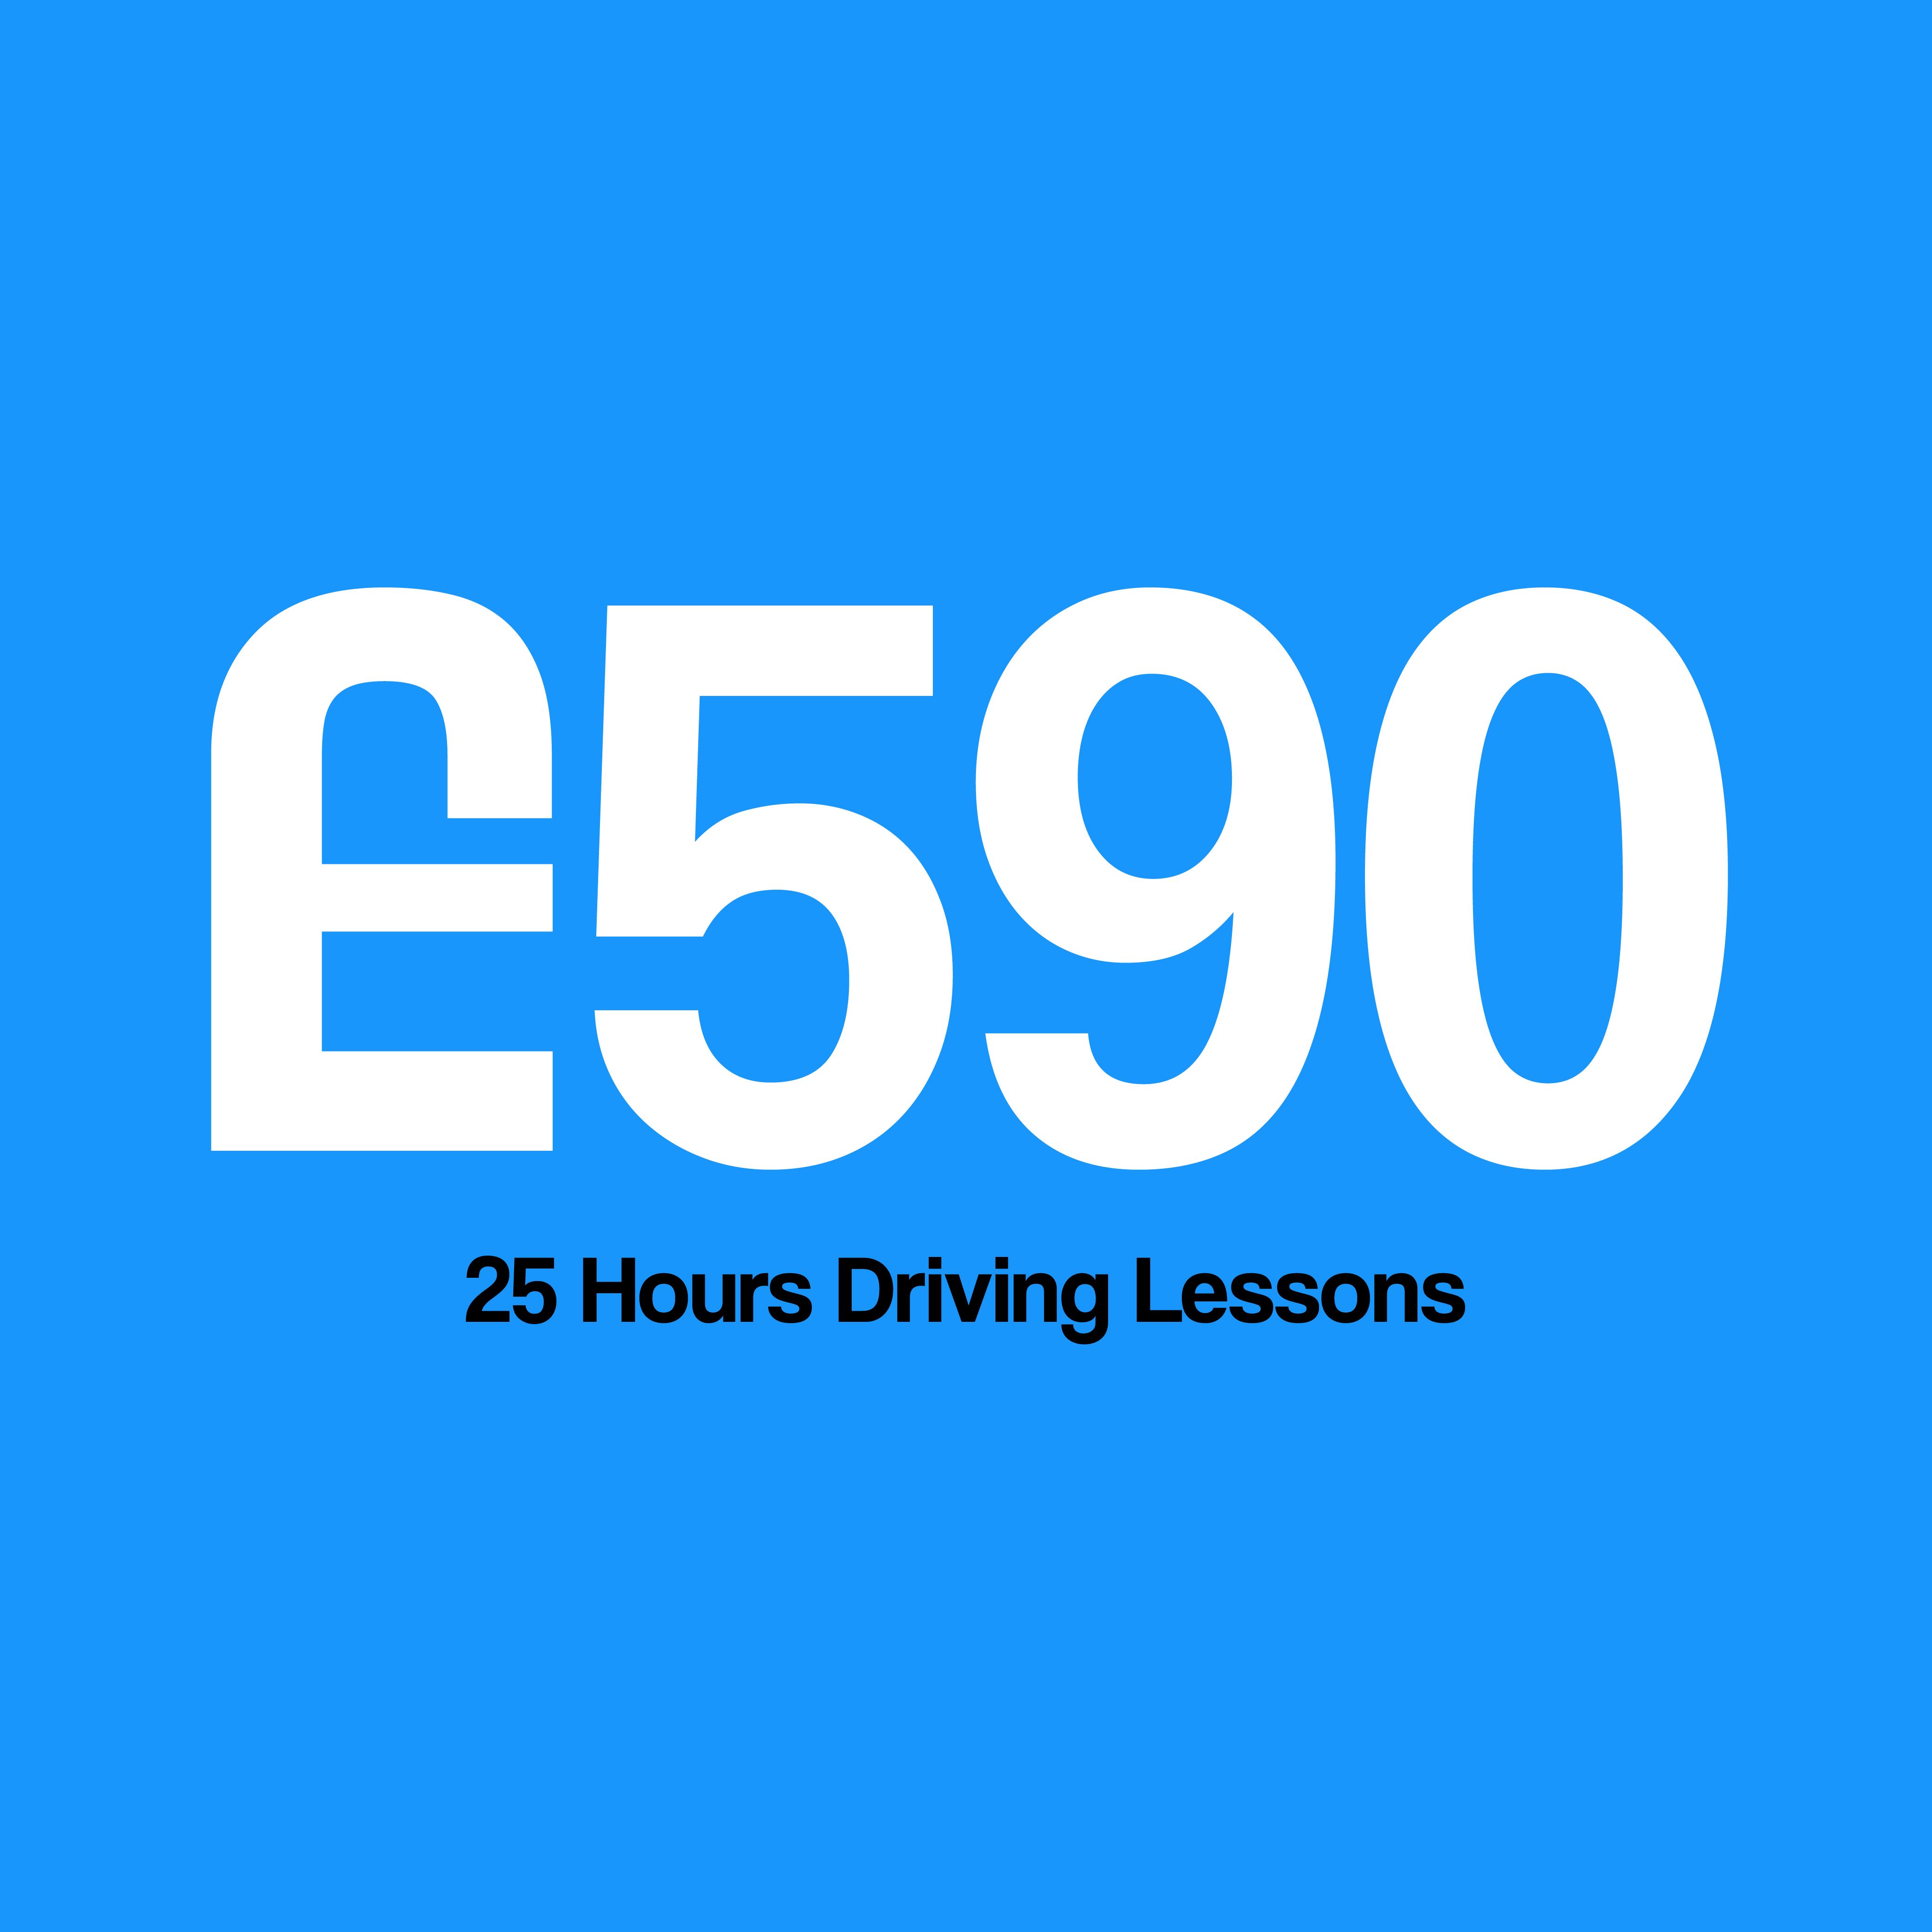 DSM School Of Motoring 25 Hours Driving Lessons